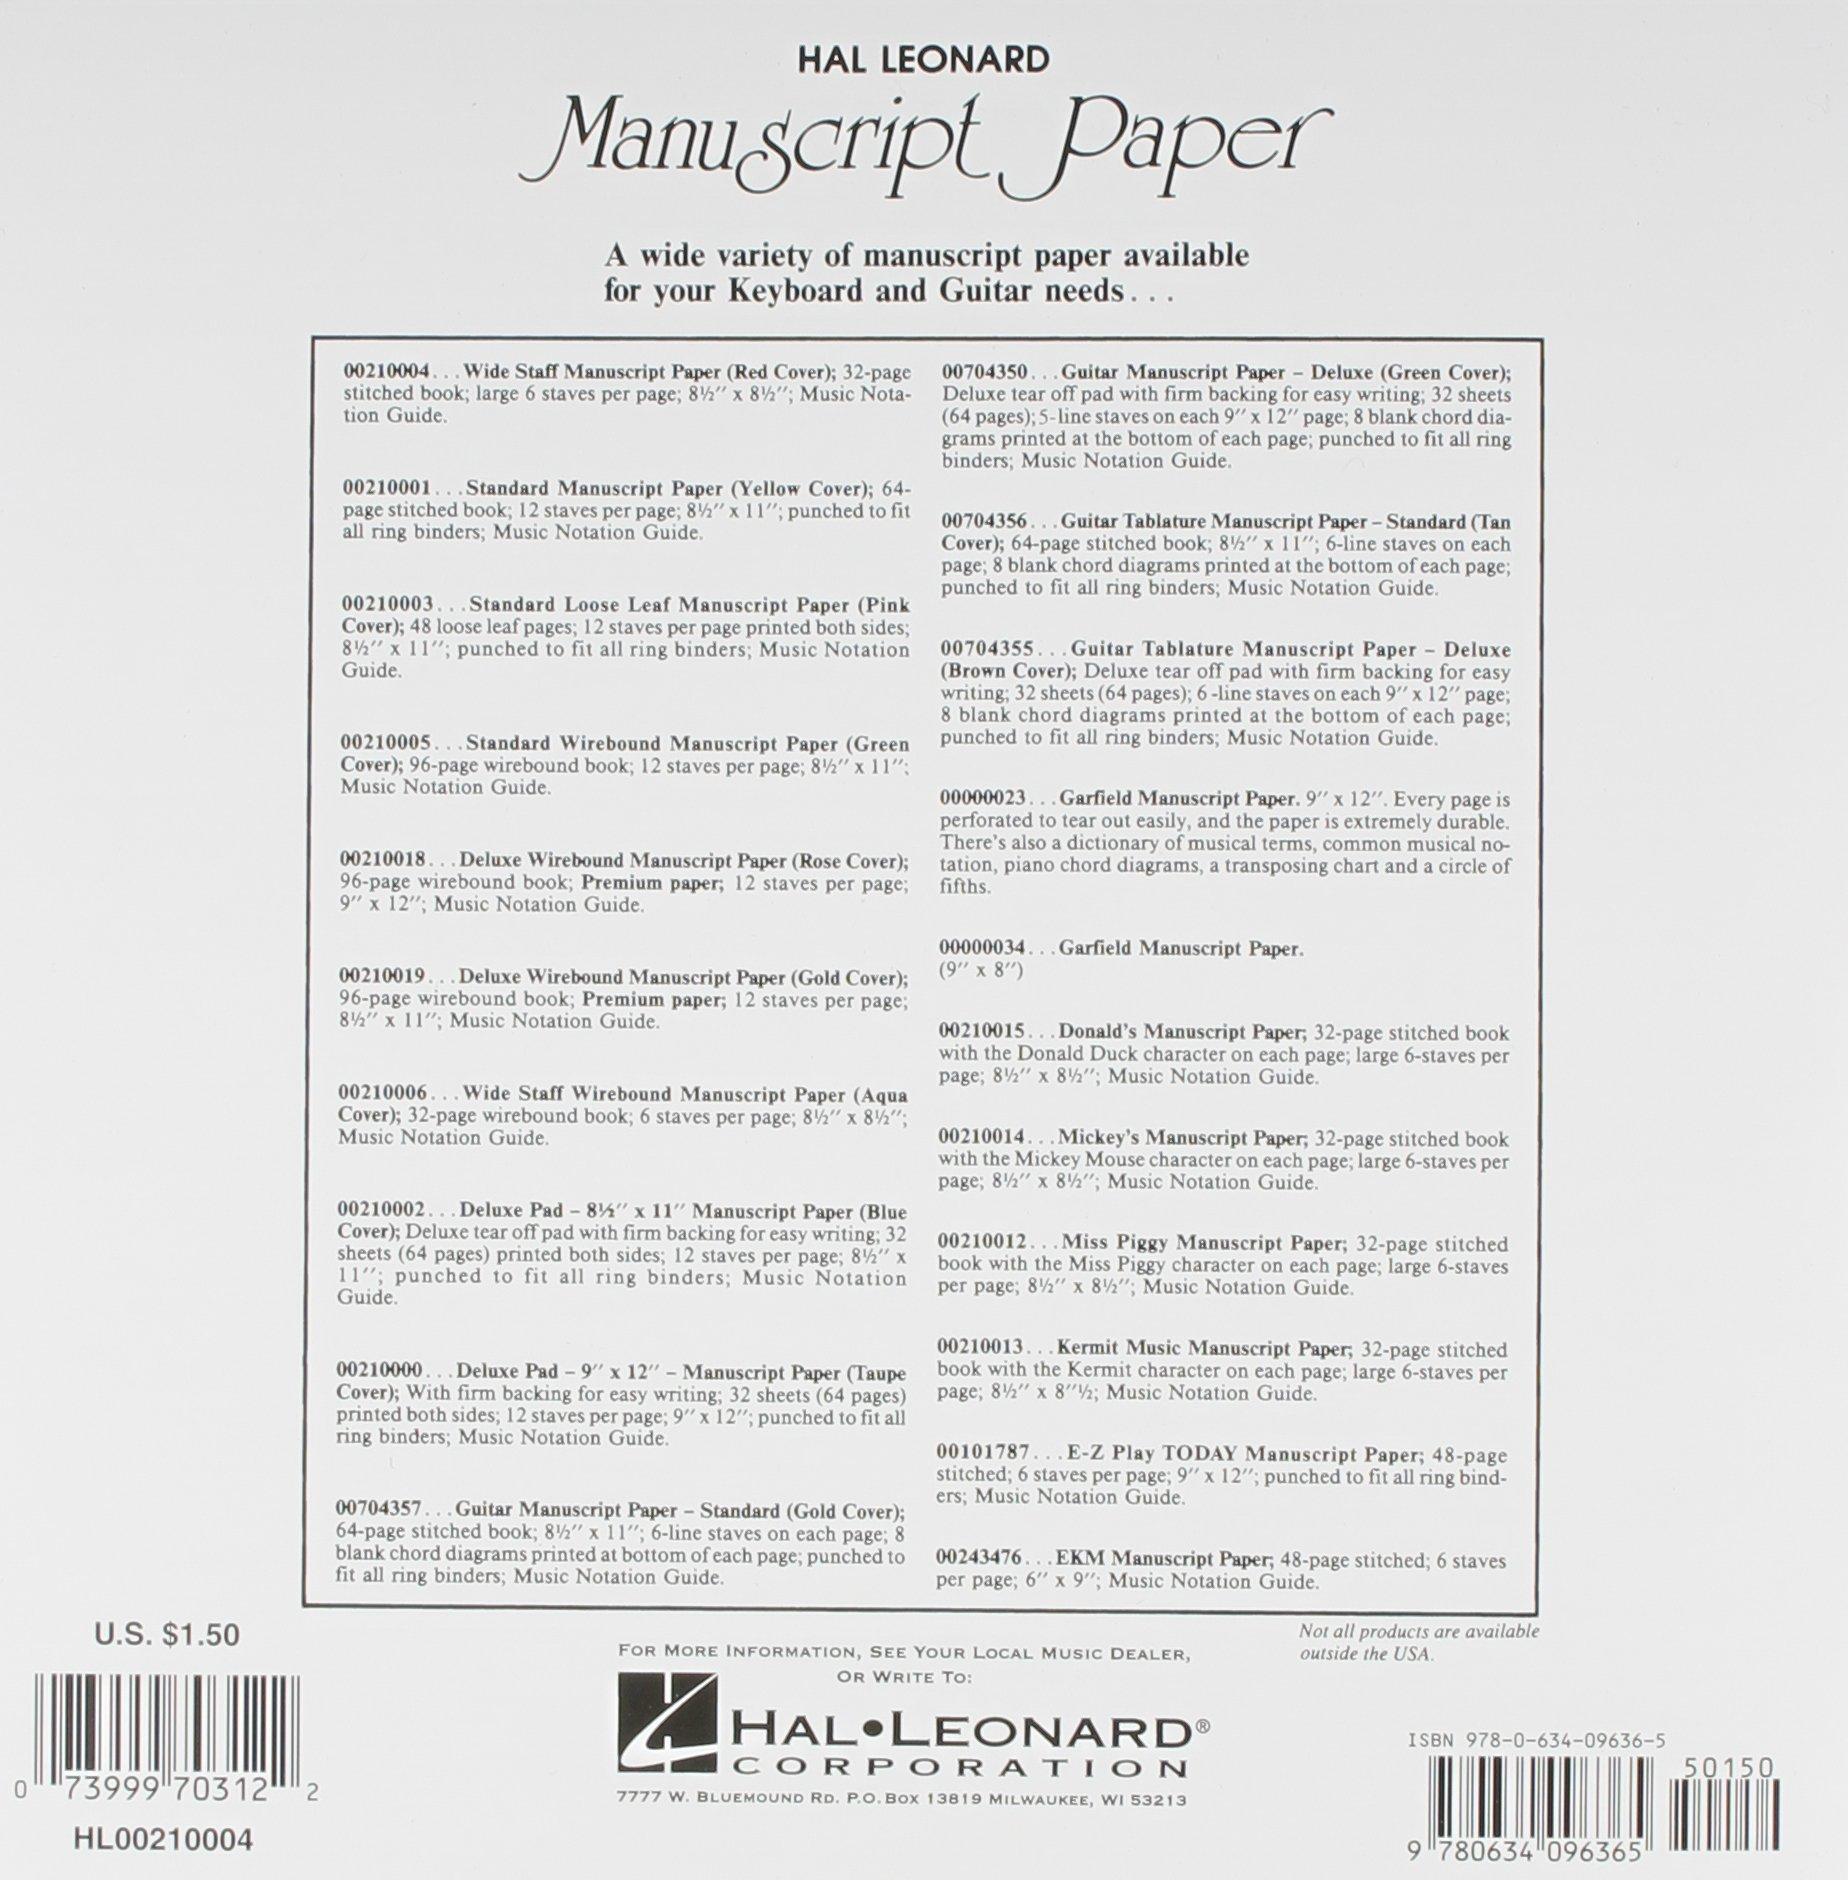 wide staff manuscript paper red cover hal leonard corp